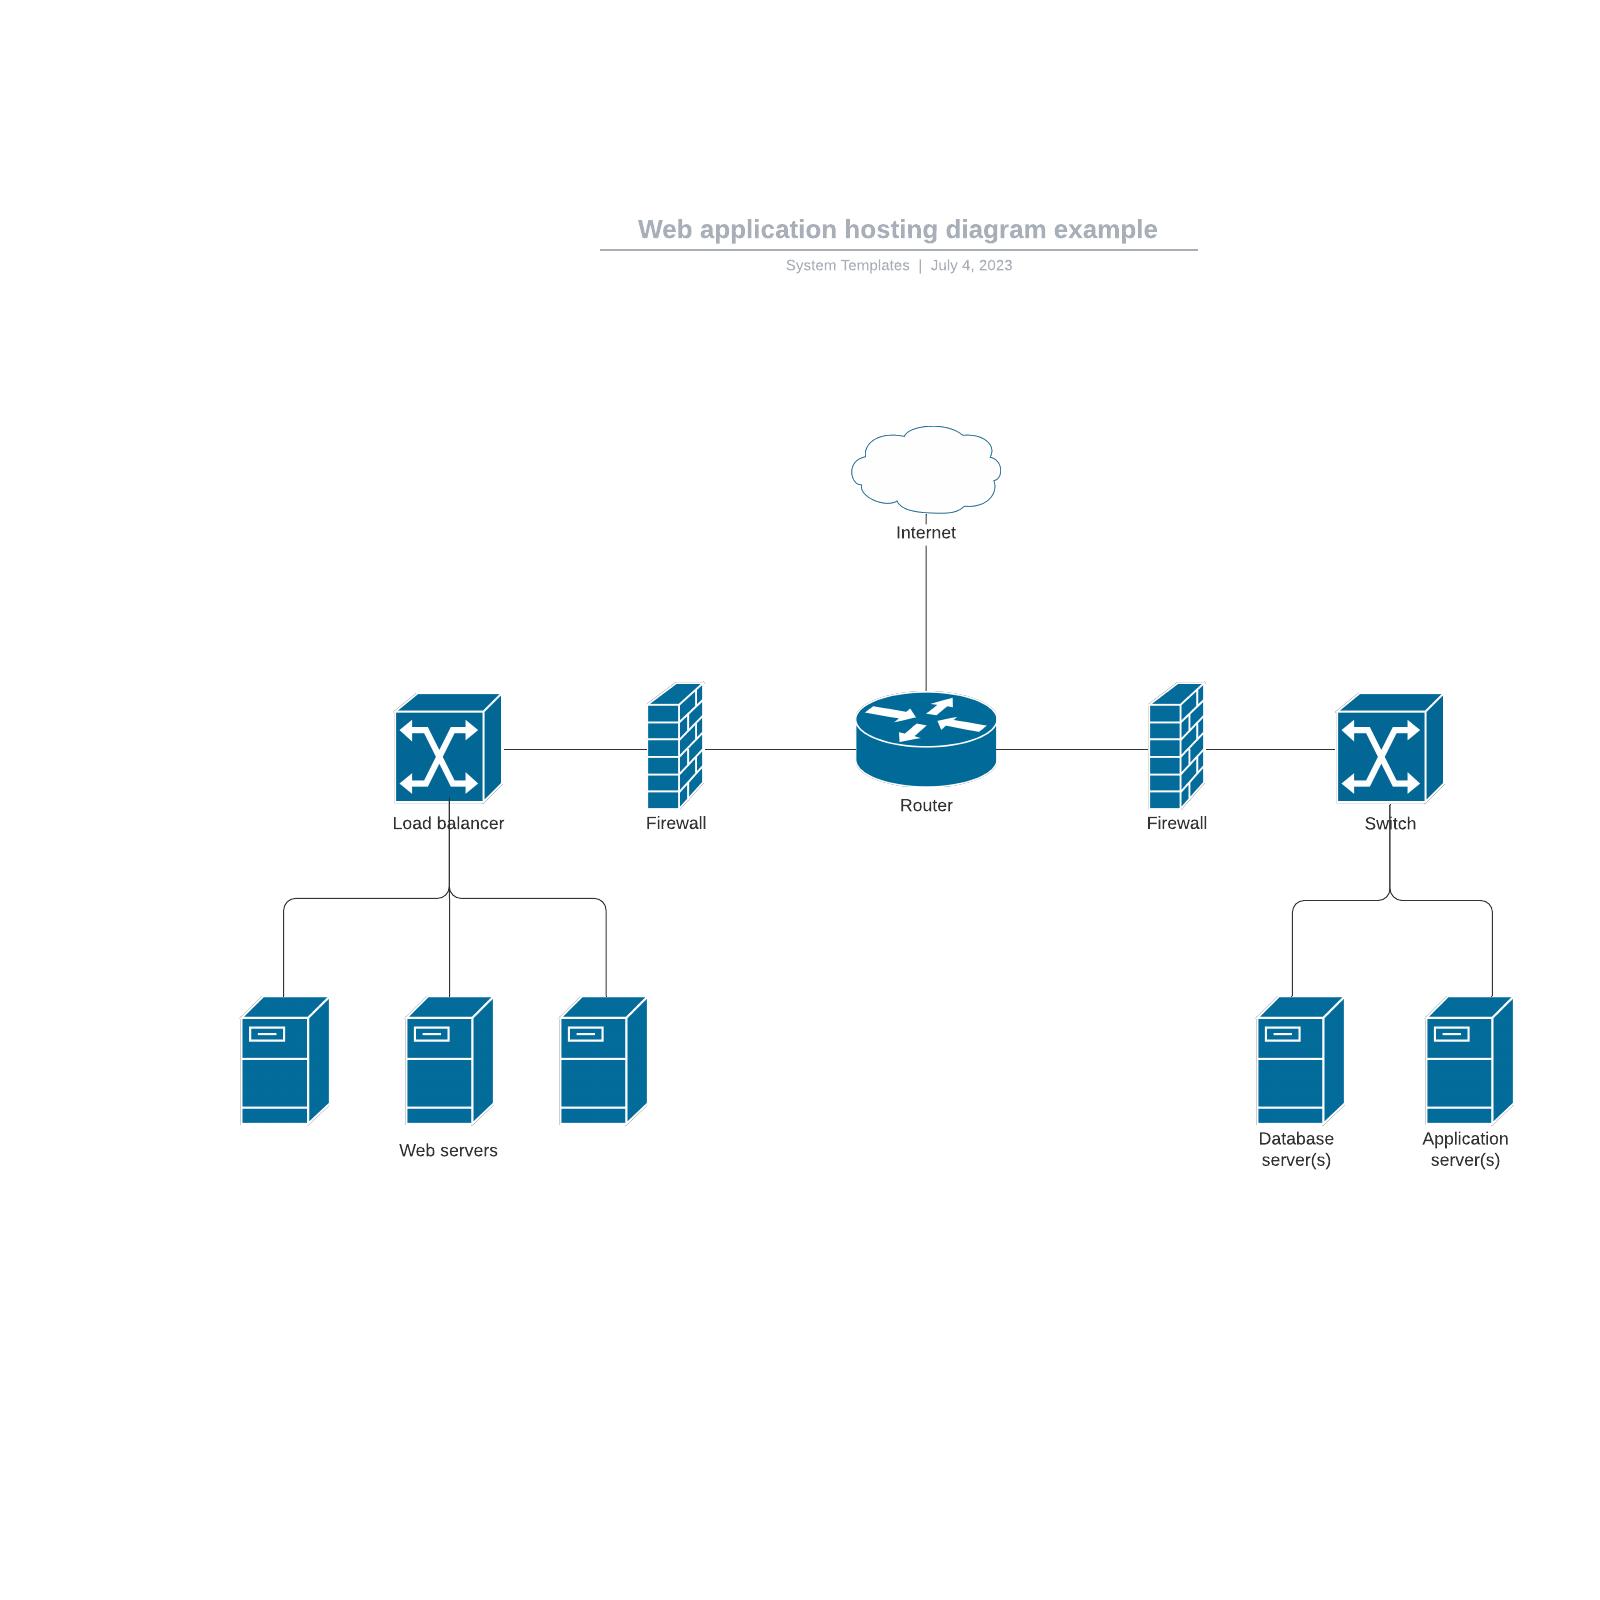 Web application hosting diagram example